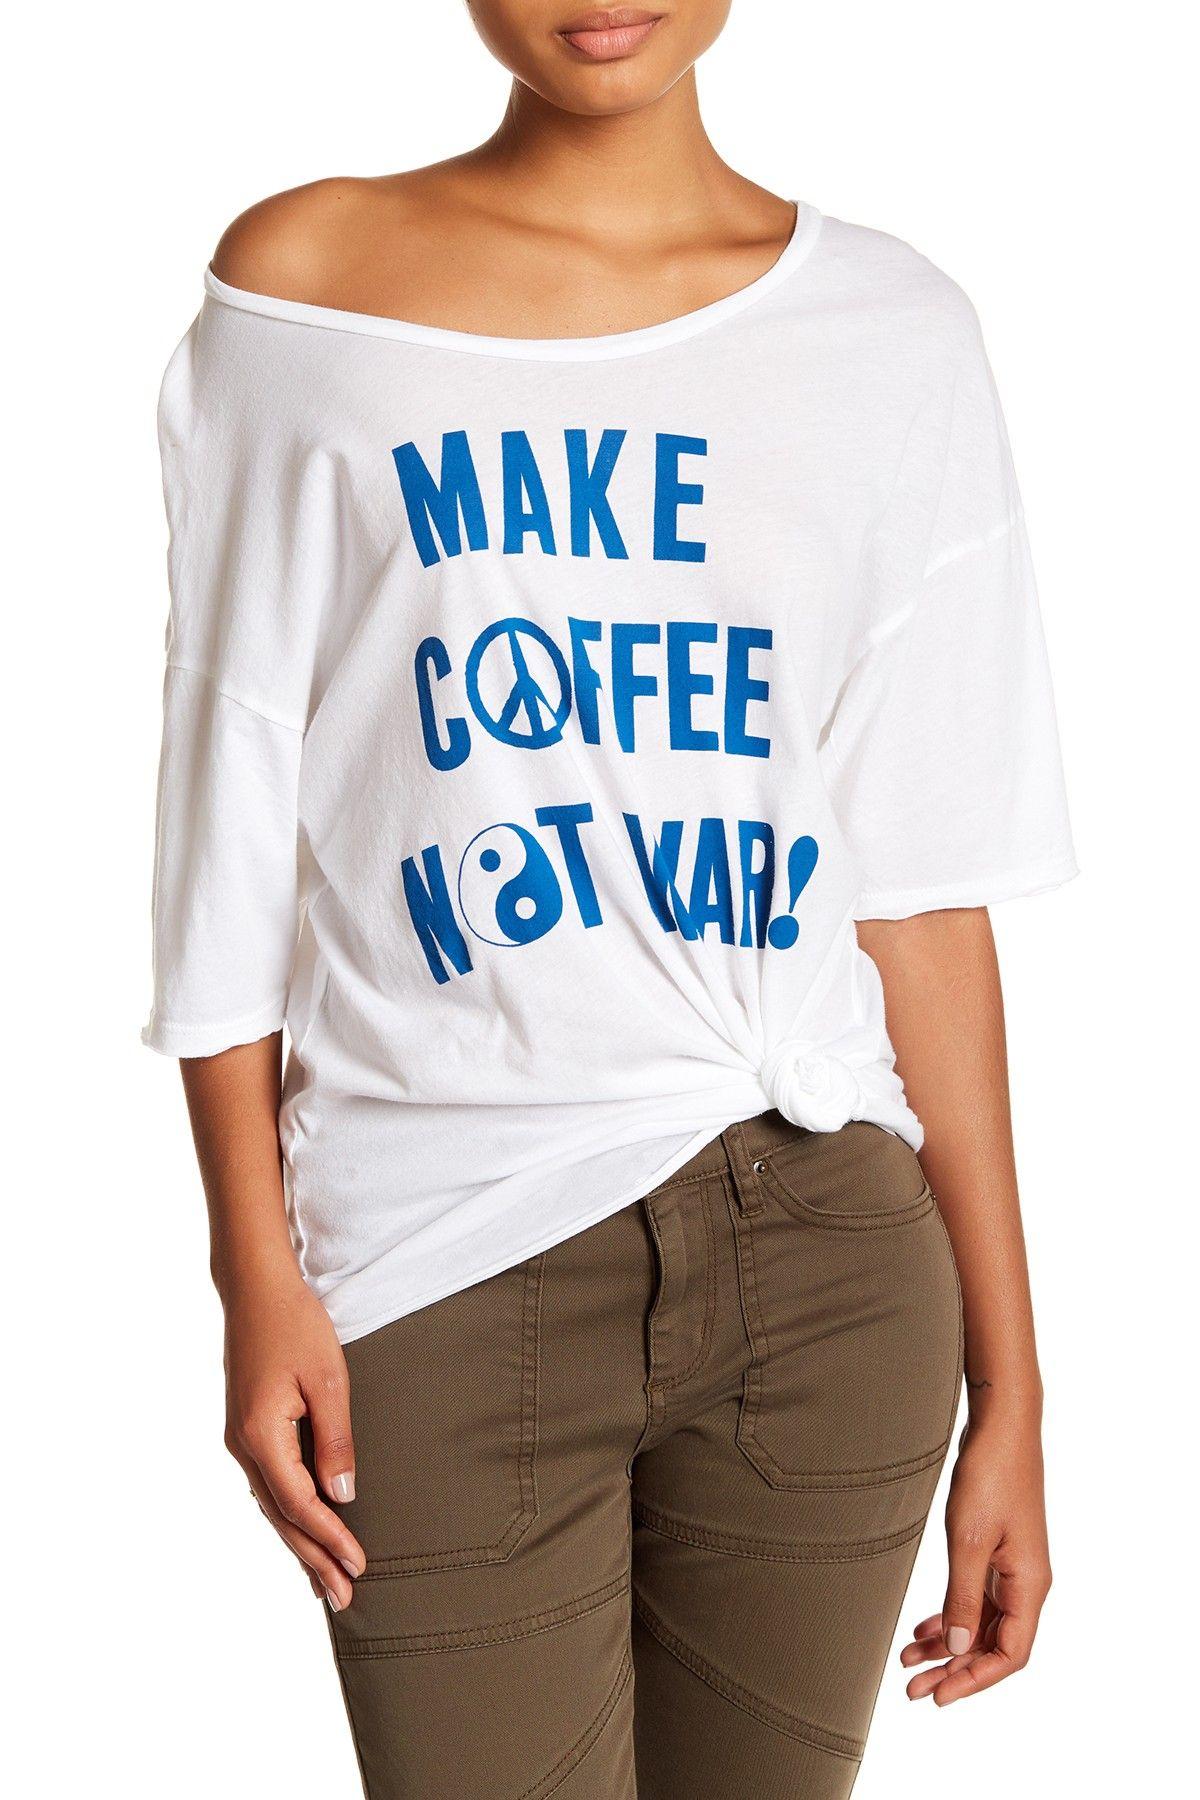 JUNKFOOD Make Coffee Not Jersey Tee Tees, Sweatshirts